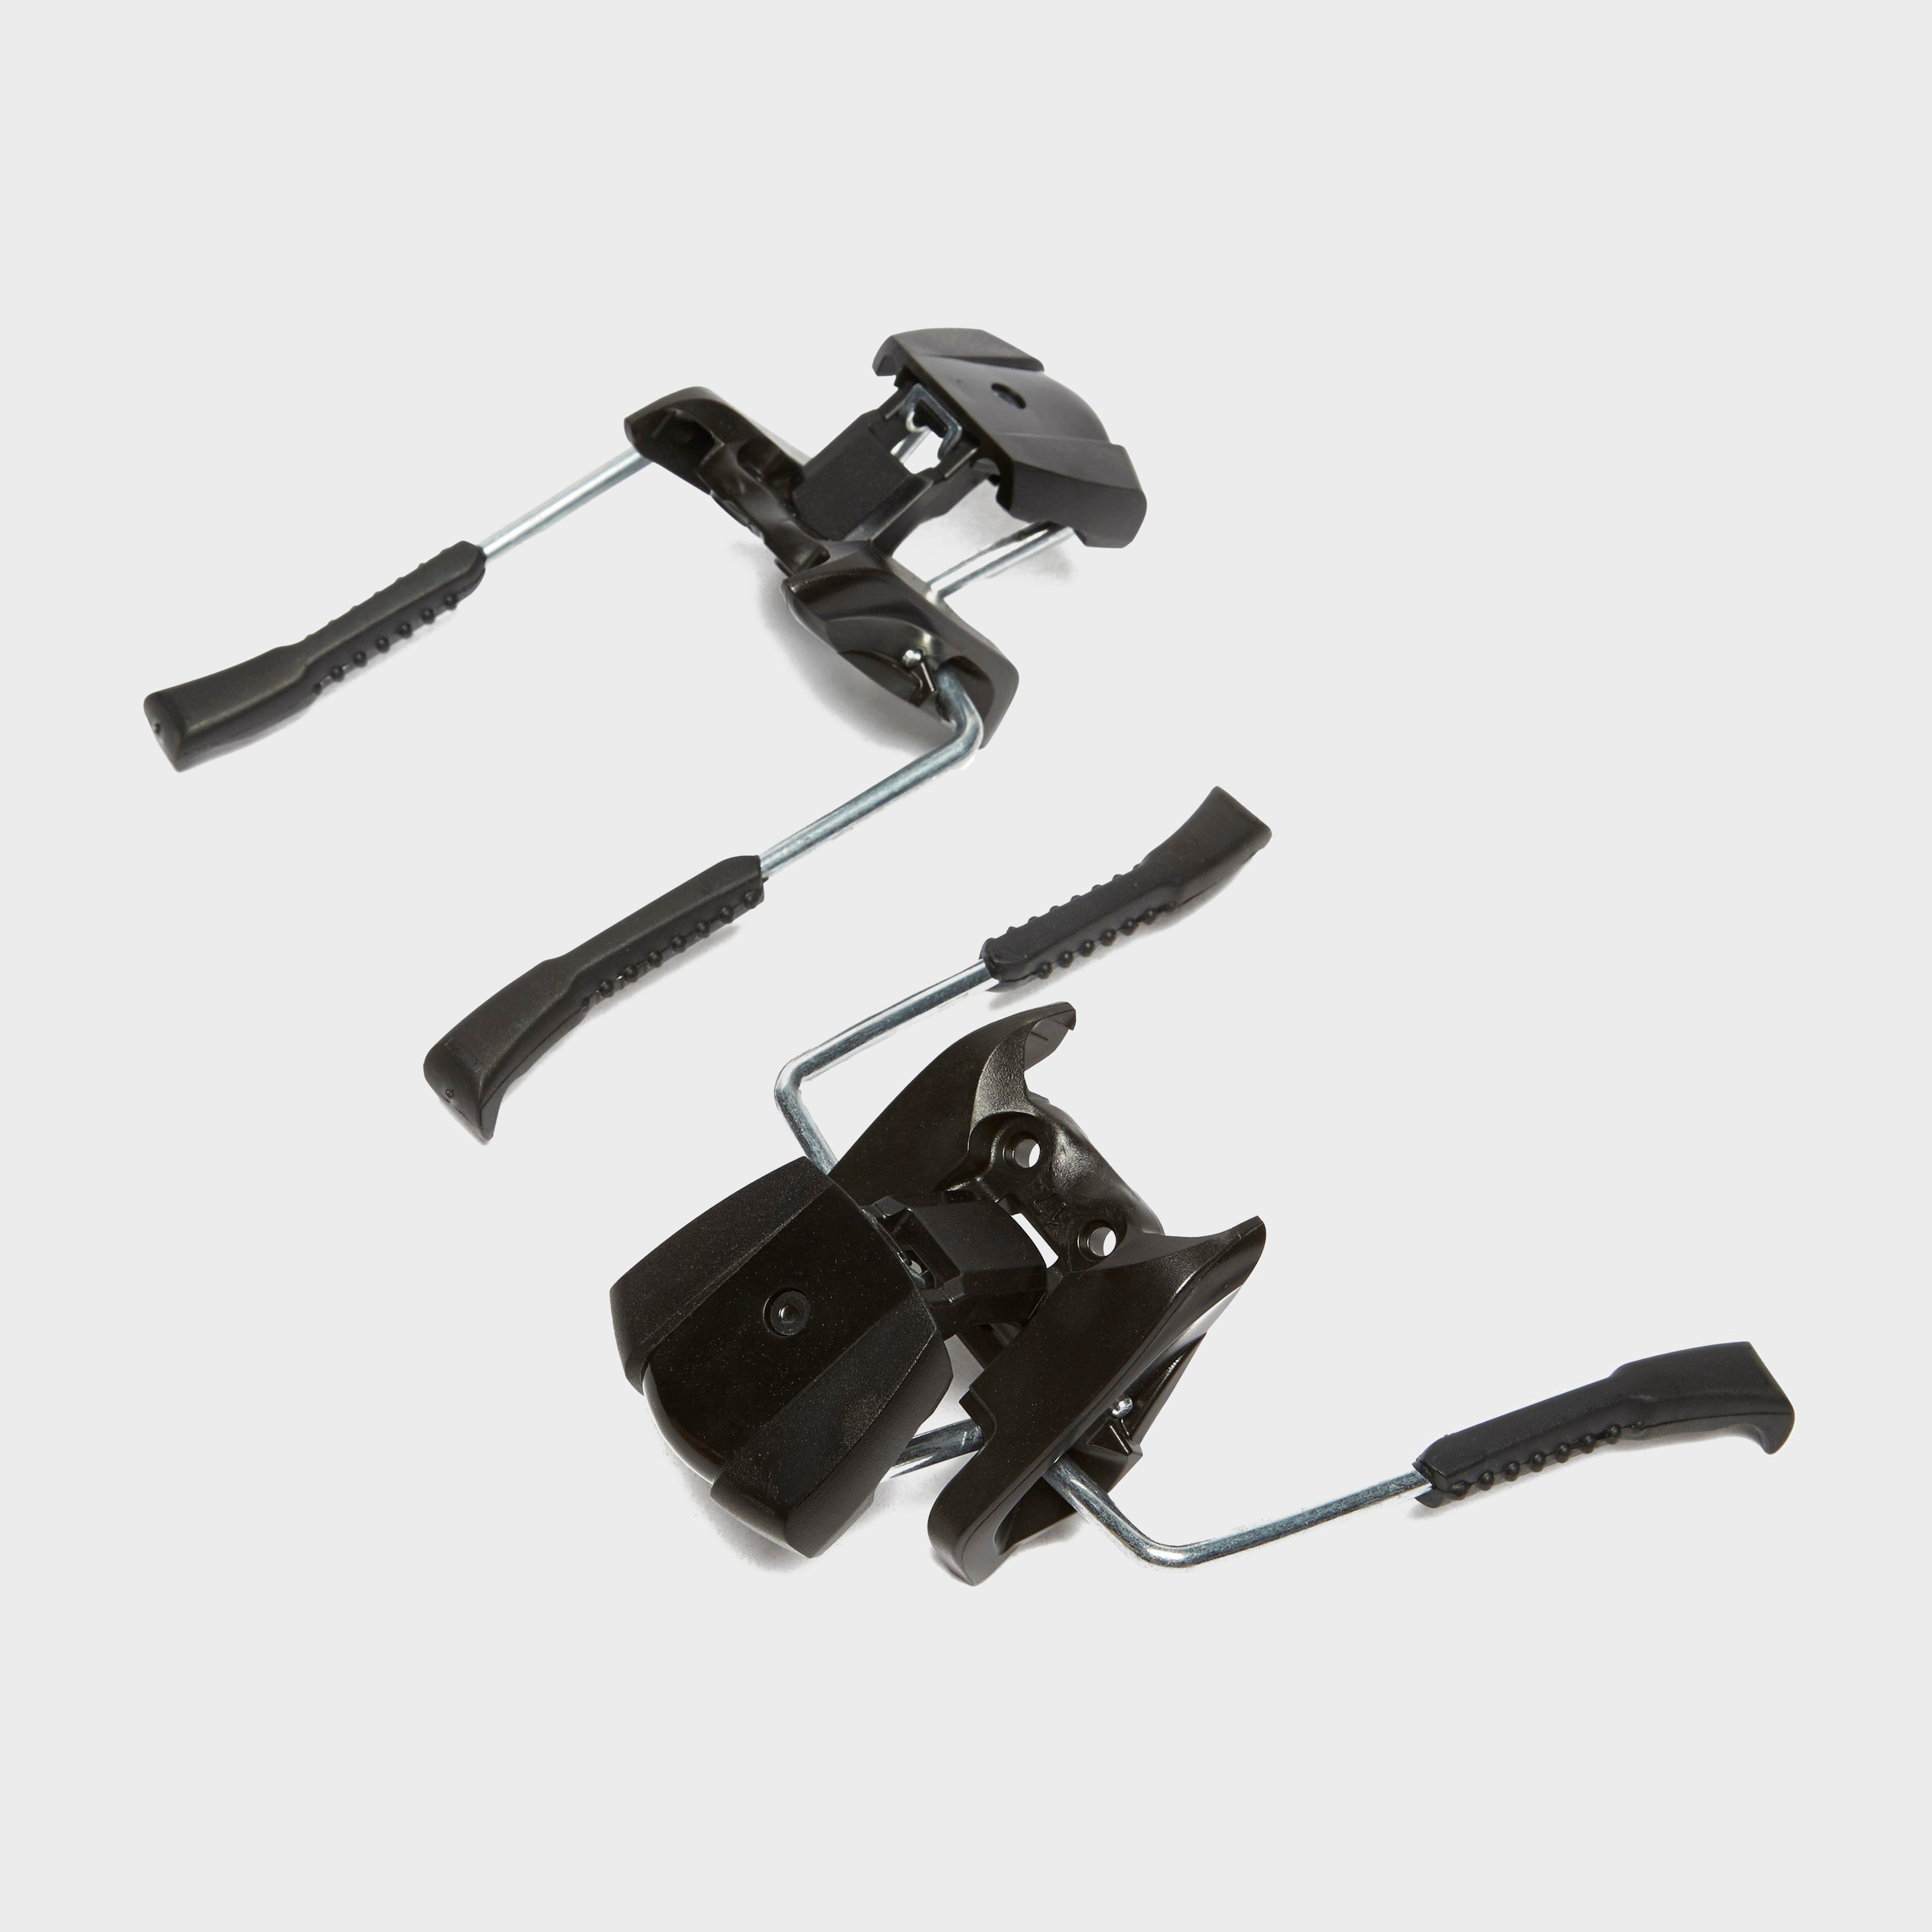 FISCHER SPORTS X11 & Attack 13 Bindings Brake Pro - 115mm